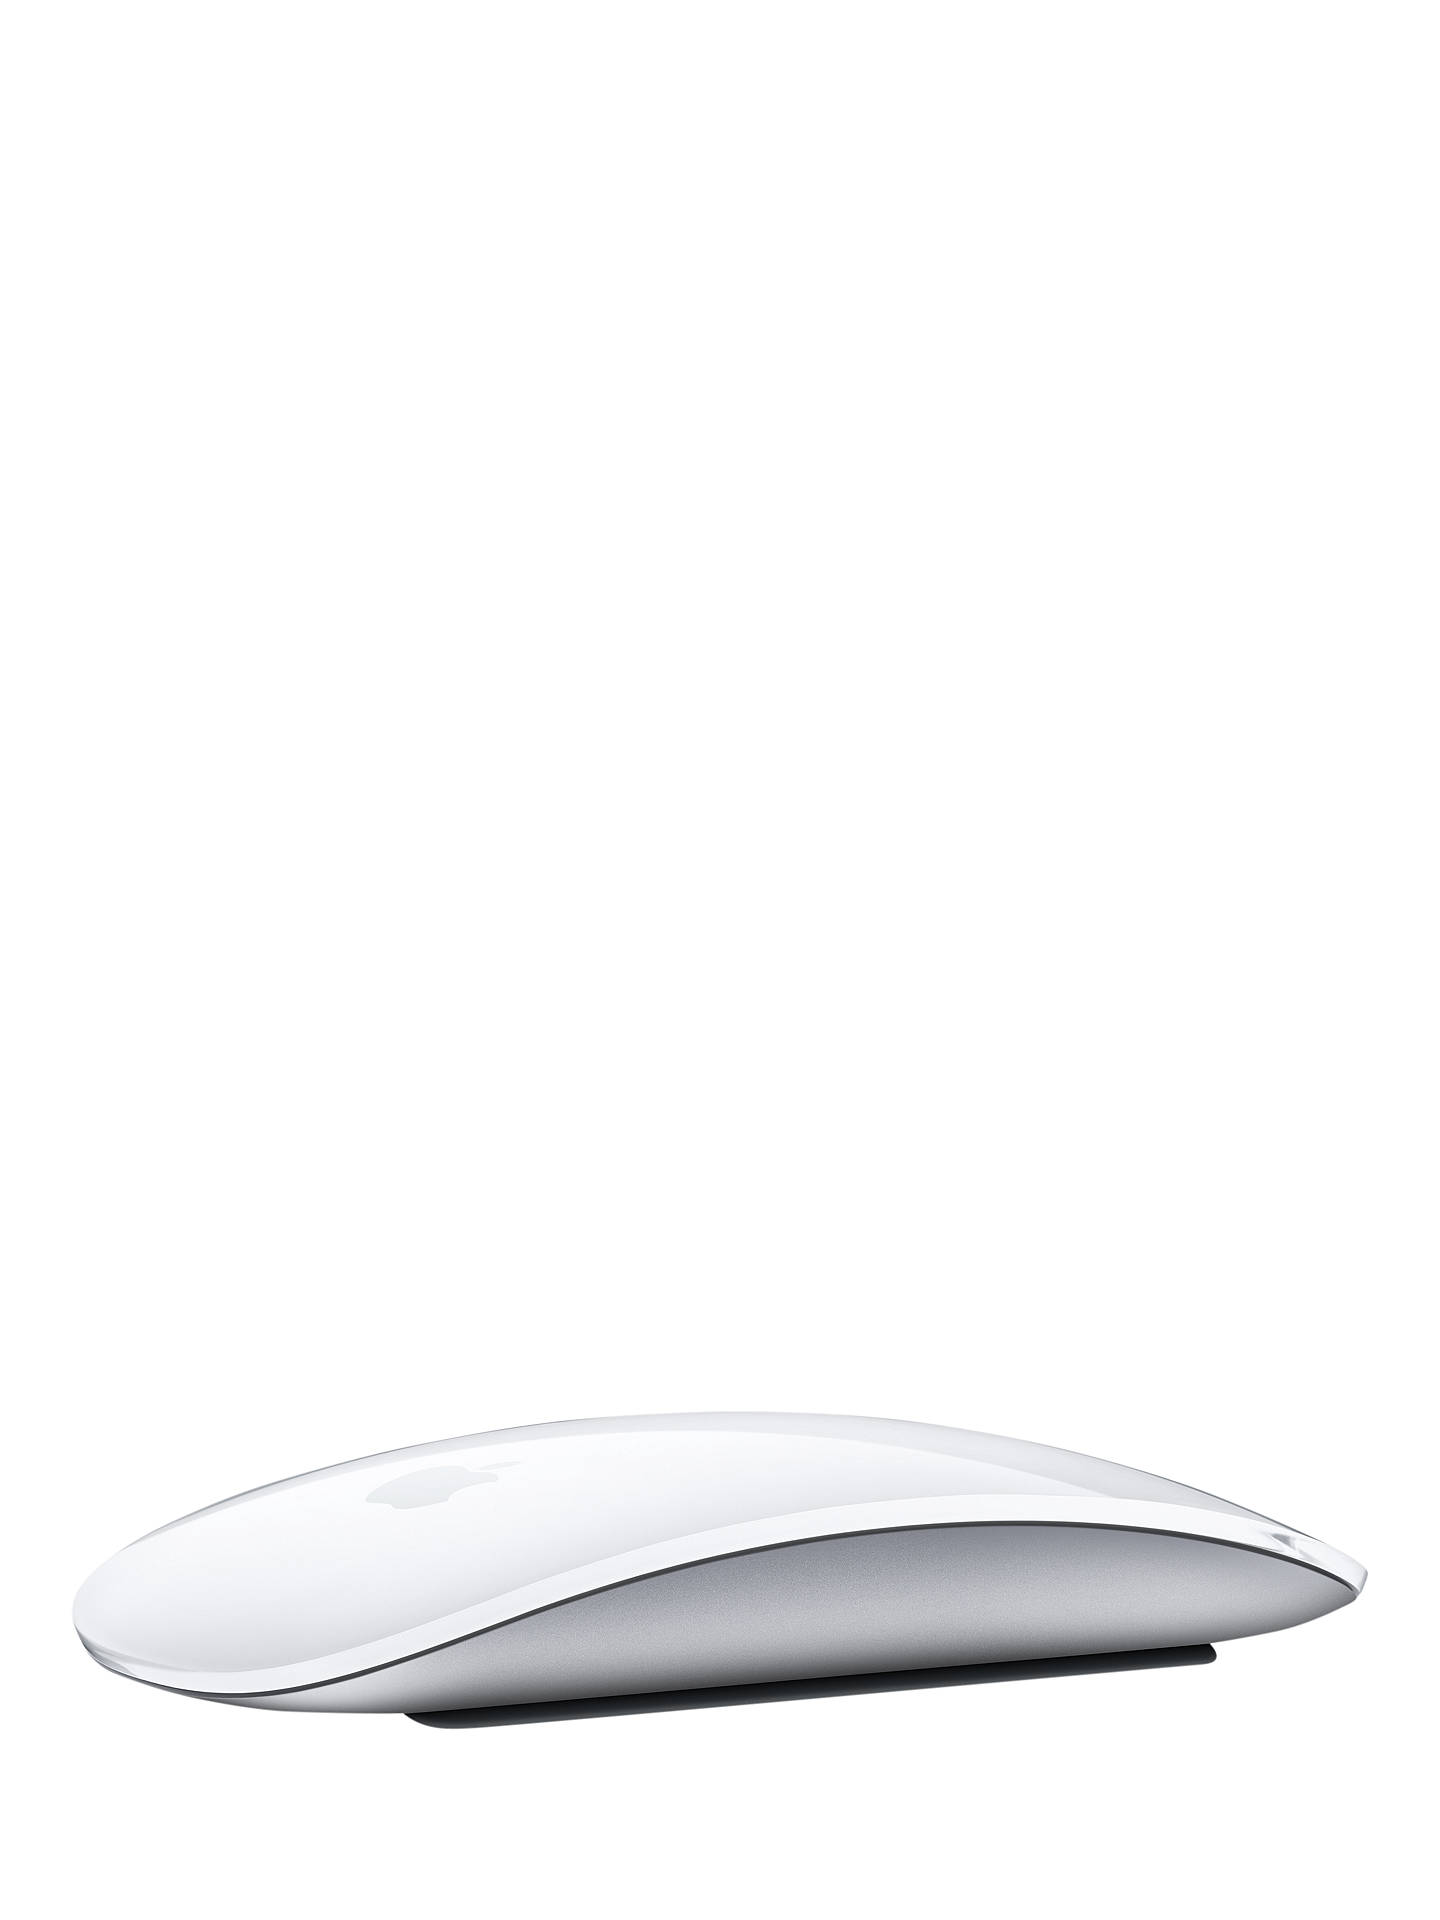 023ed02cf63 Buy Apple MLA02ZM/A Magic Mouse 2, White Online at johnlewis.com